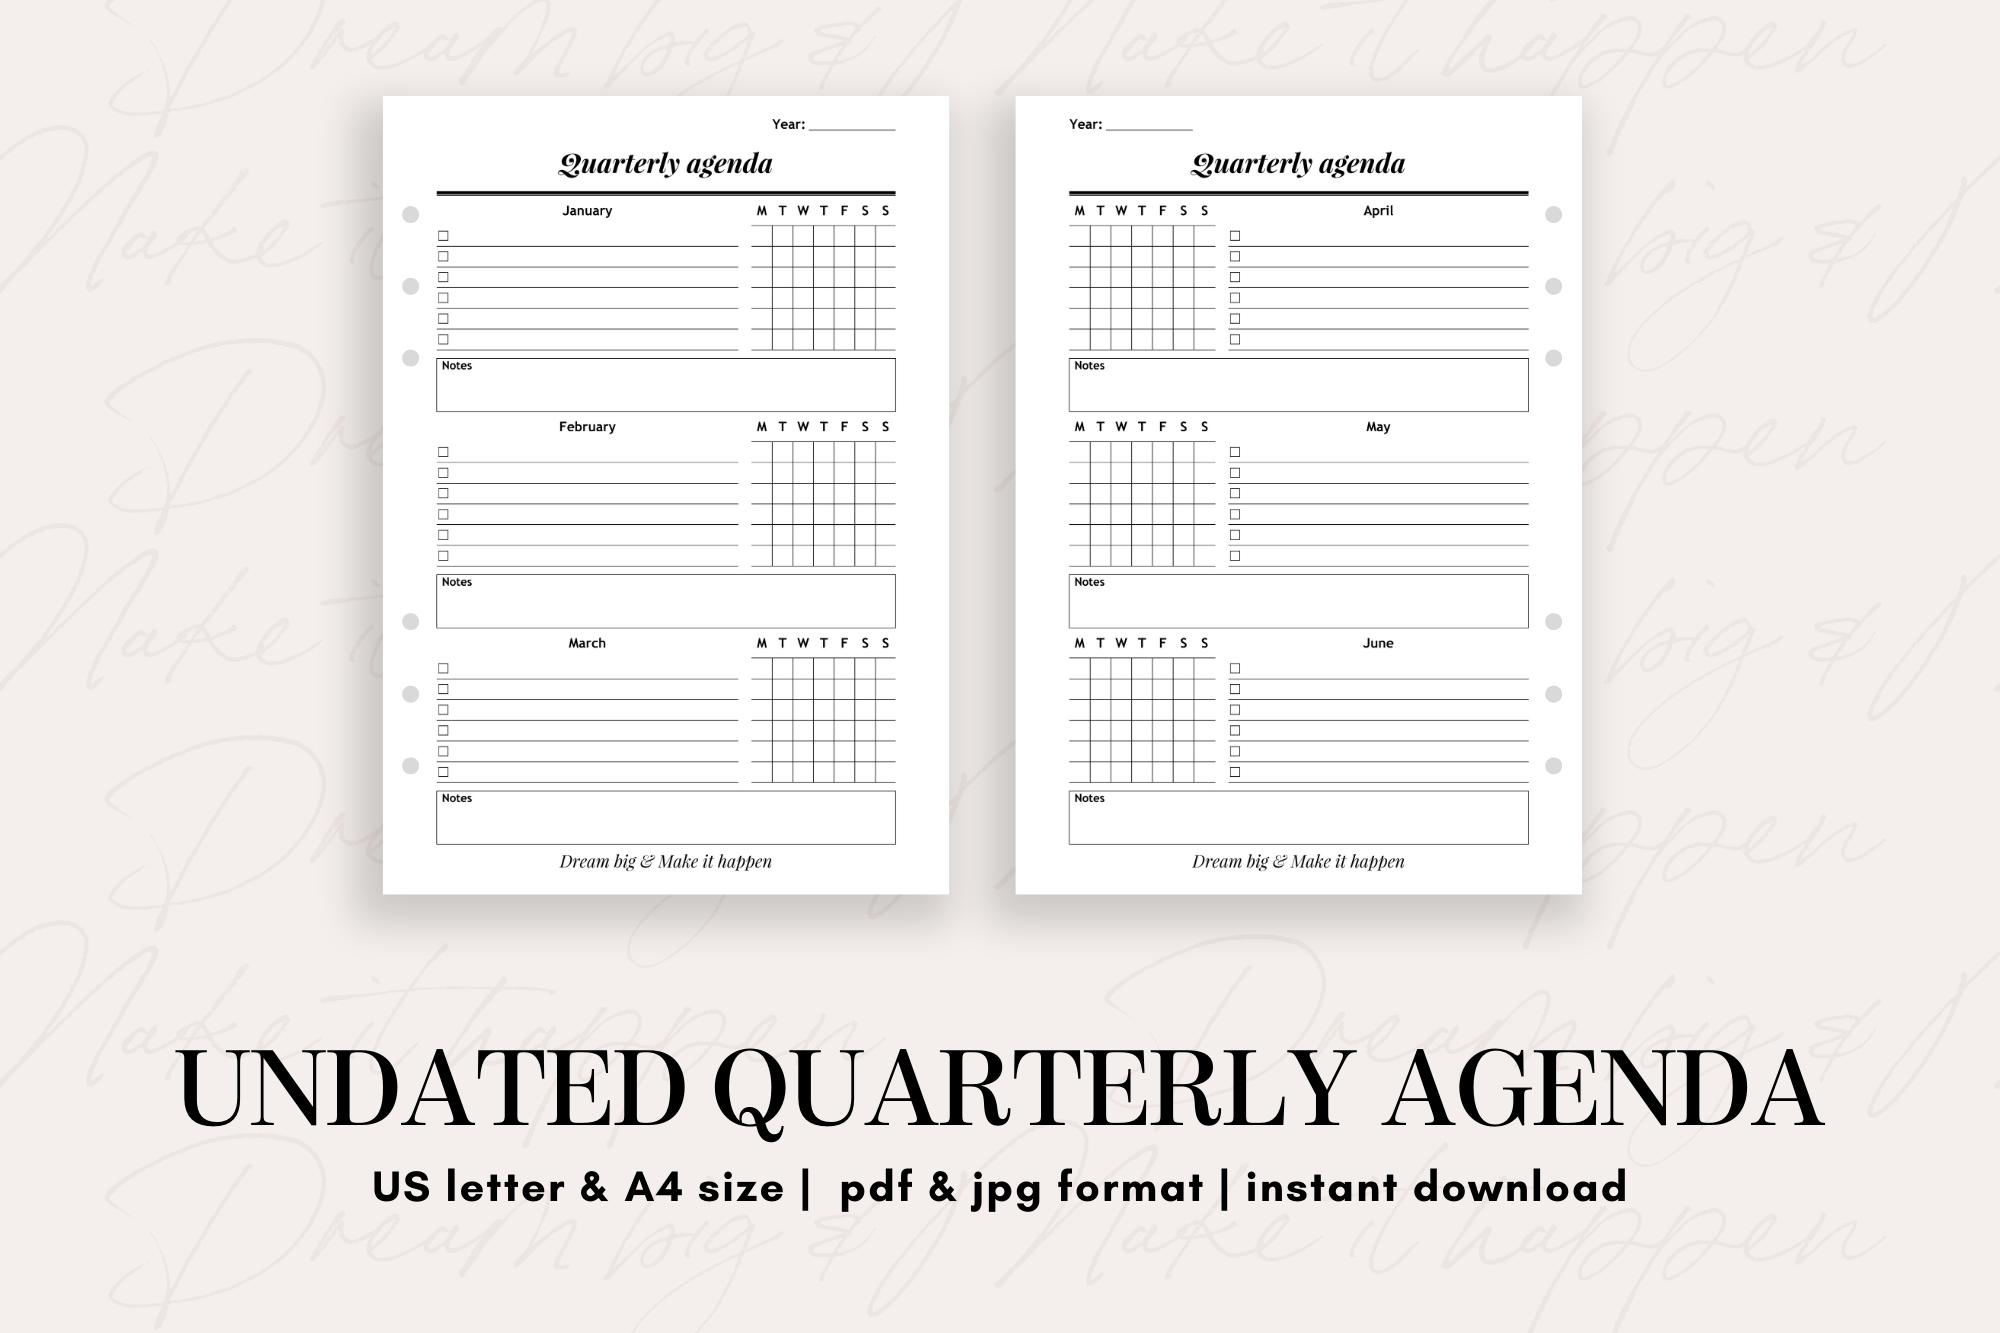 Undated Quarterly Agenda - teacher resources, school activities, financial planning, budgeting, art education, personal development, note taking, paper crafts, printable calendar